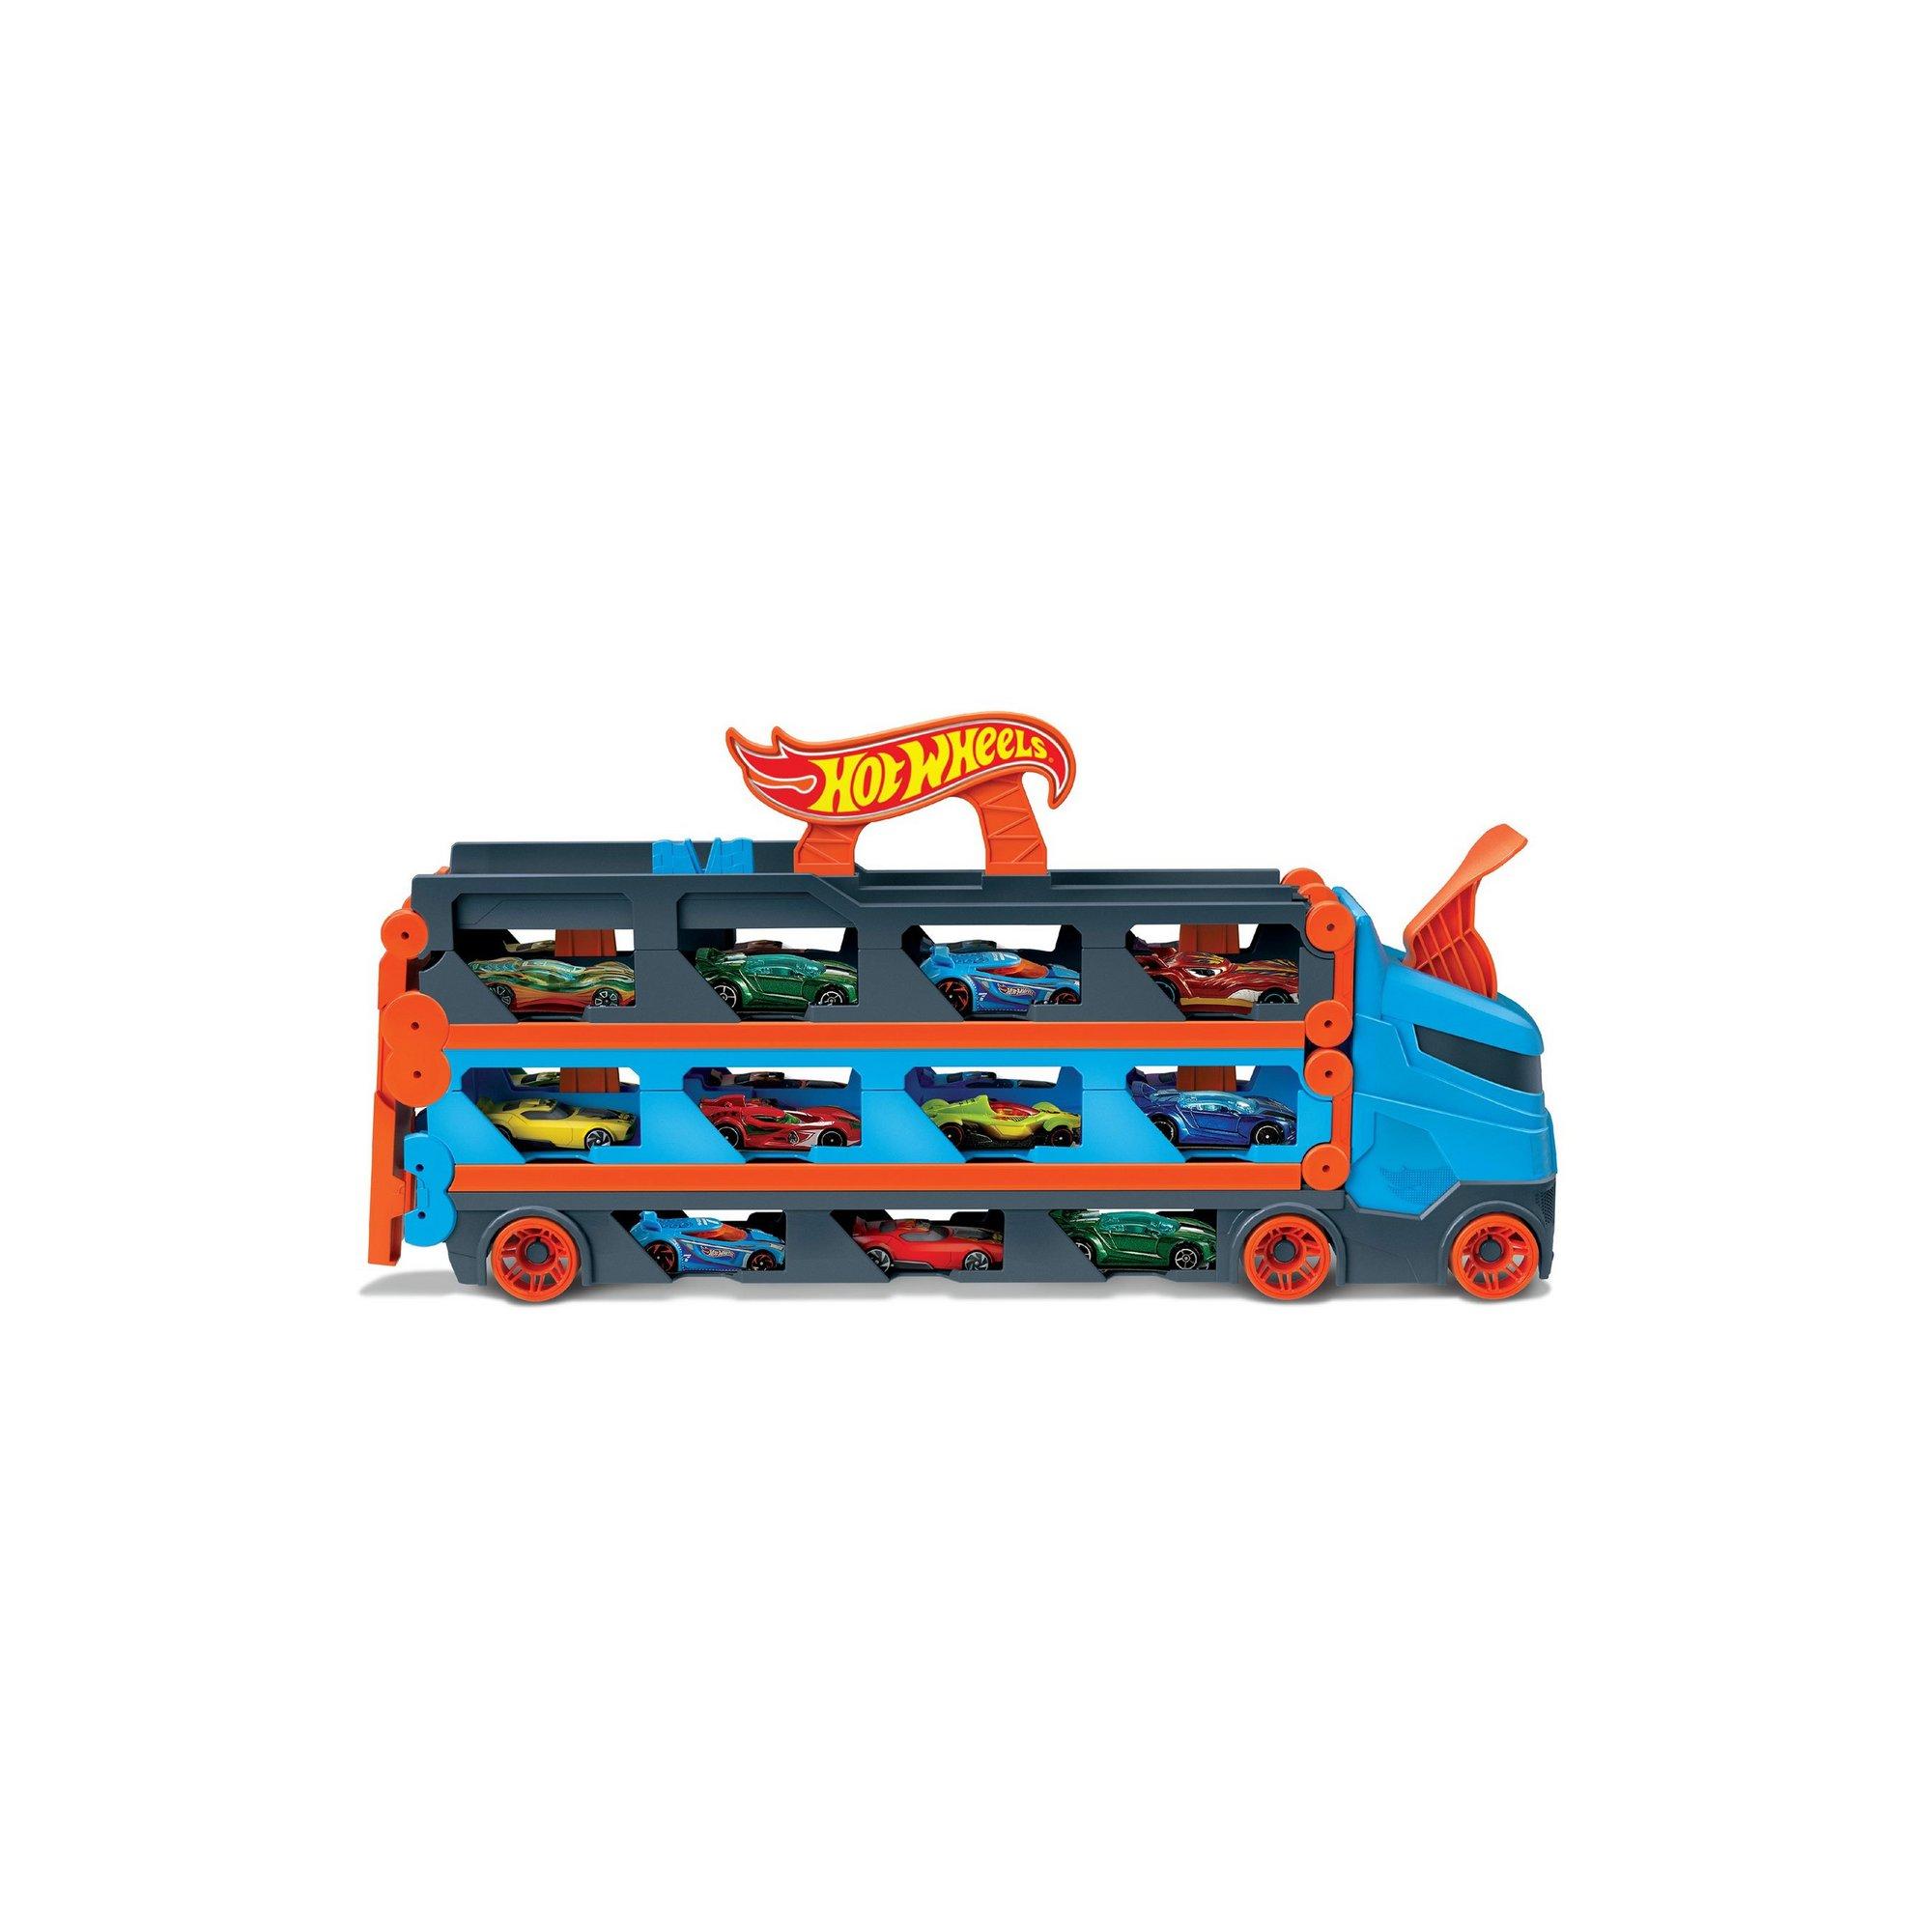 Image of Hot Wheels City Speedway Hauler Play Set